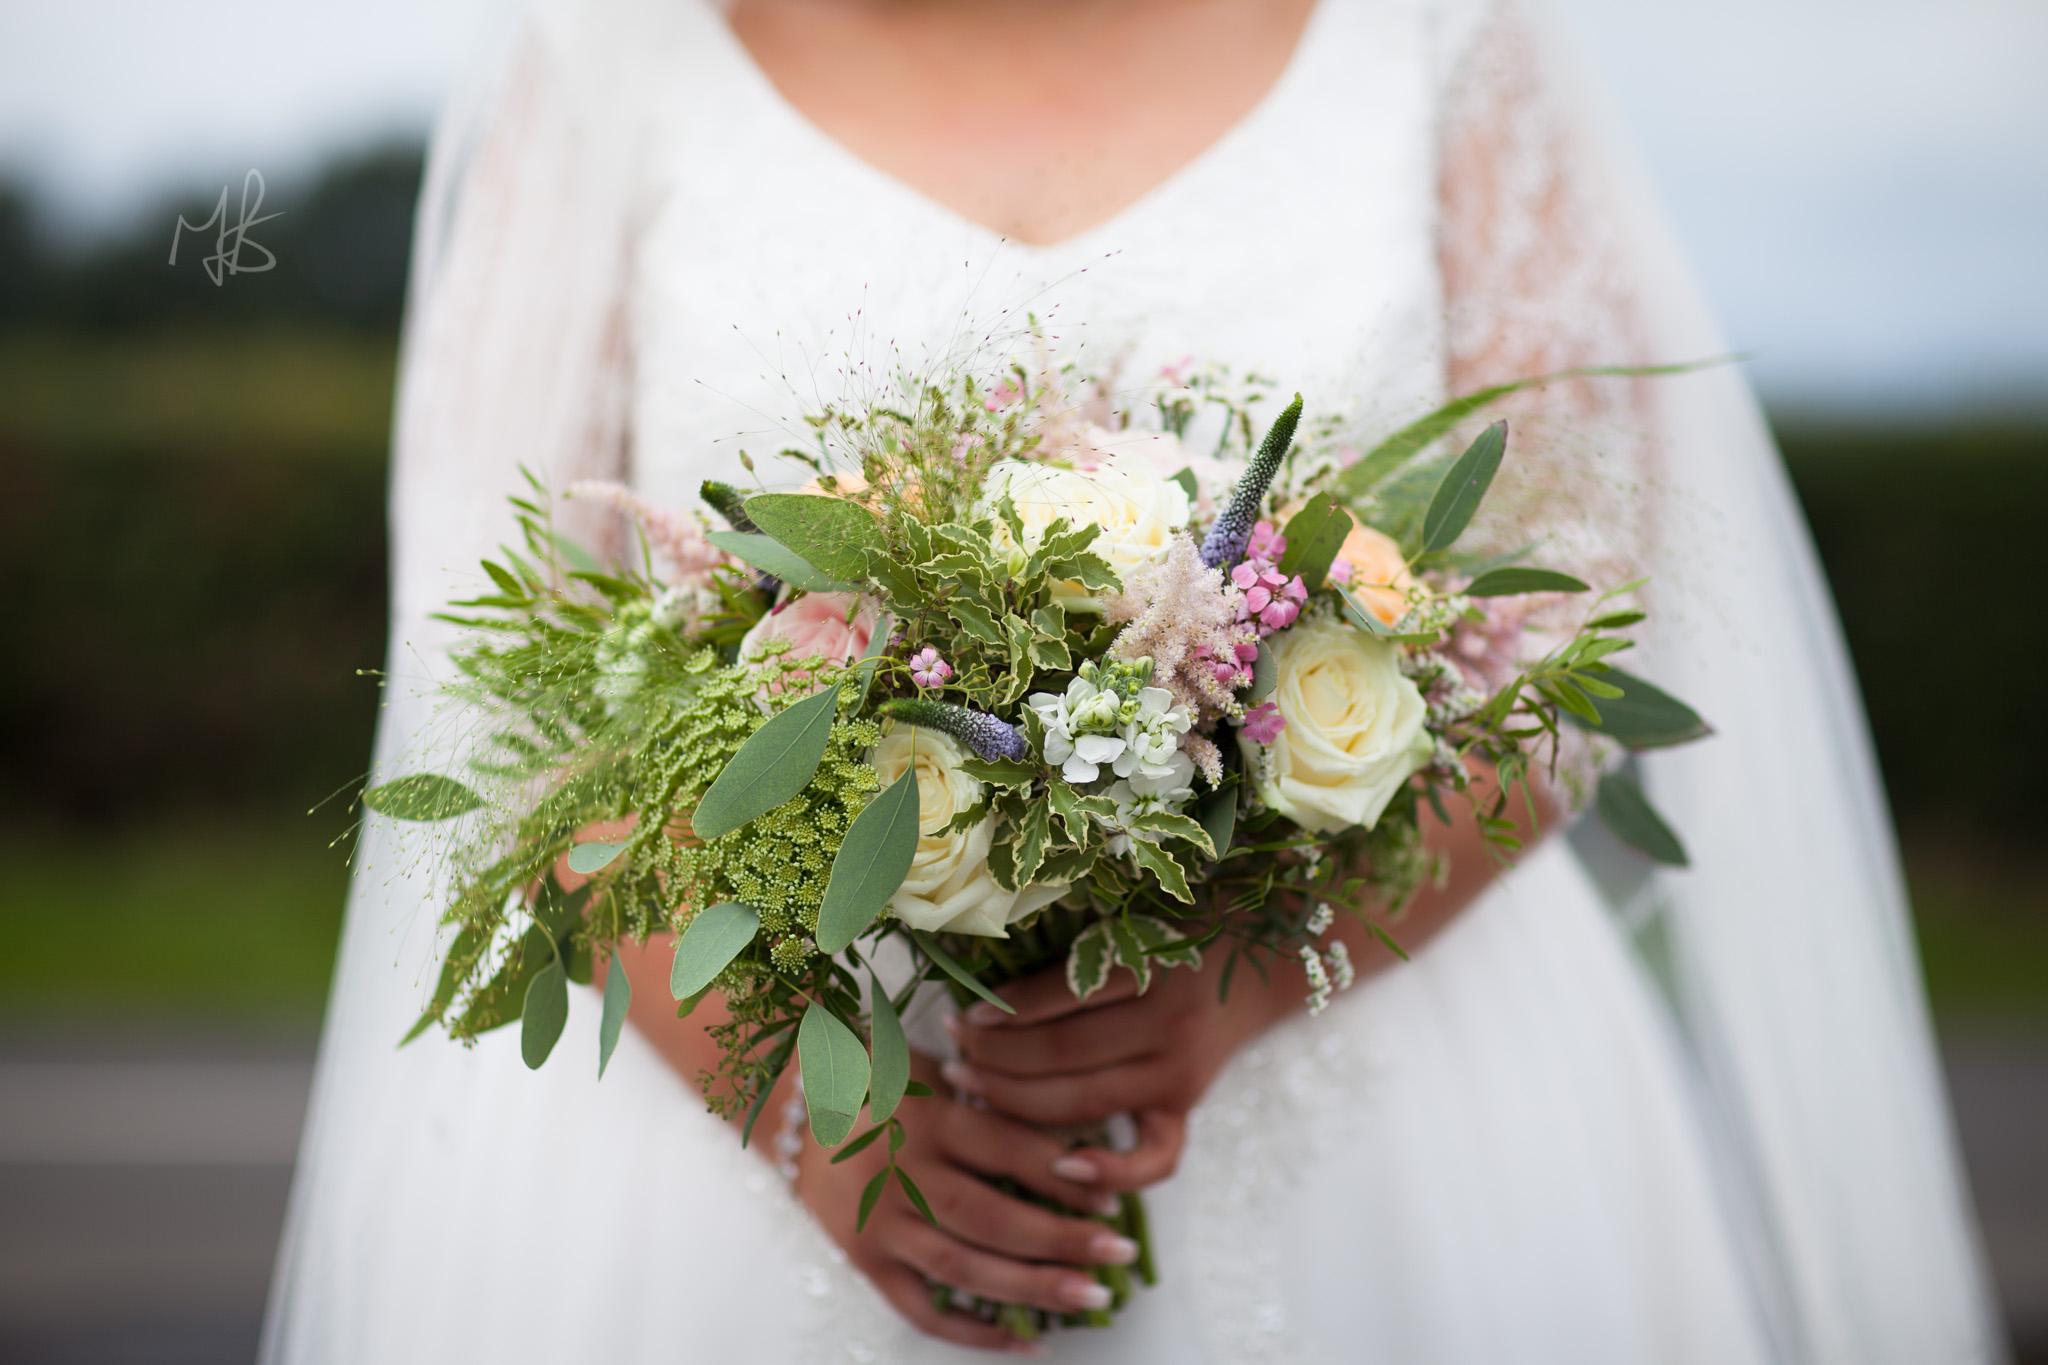 Northern-Ireland-Wedding-Photographer-Mark-Barnes-Ballymena_wedding-photography-Leighinmohr-House-Seamas_Alanna_For-web-14.jpg